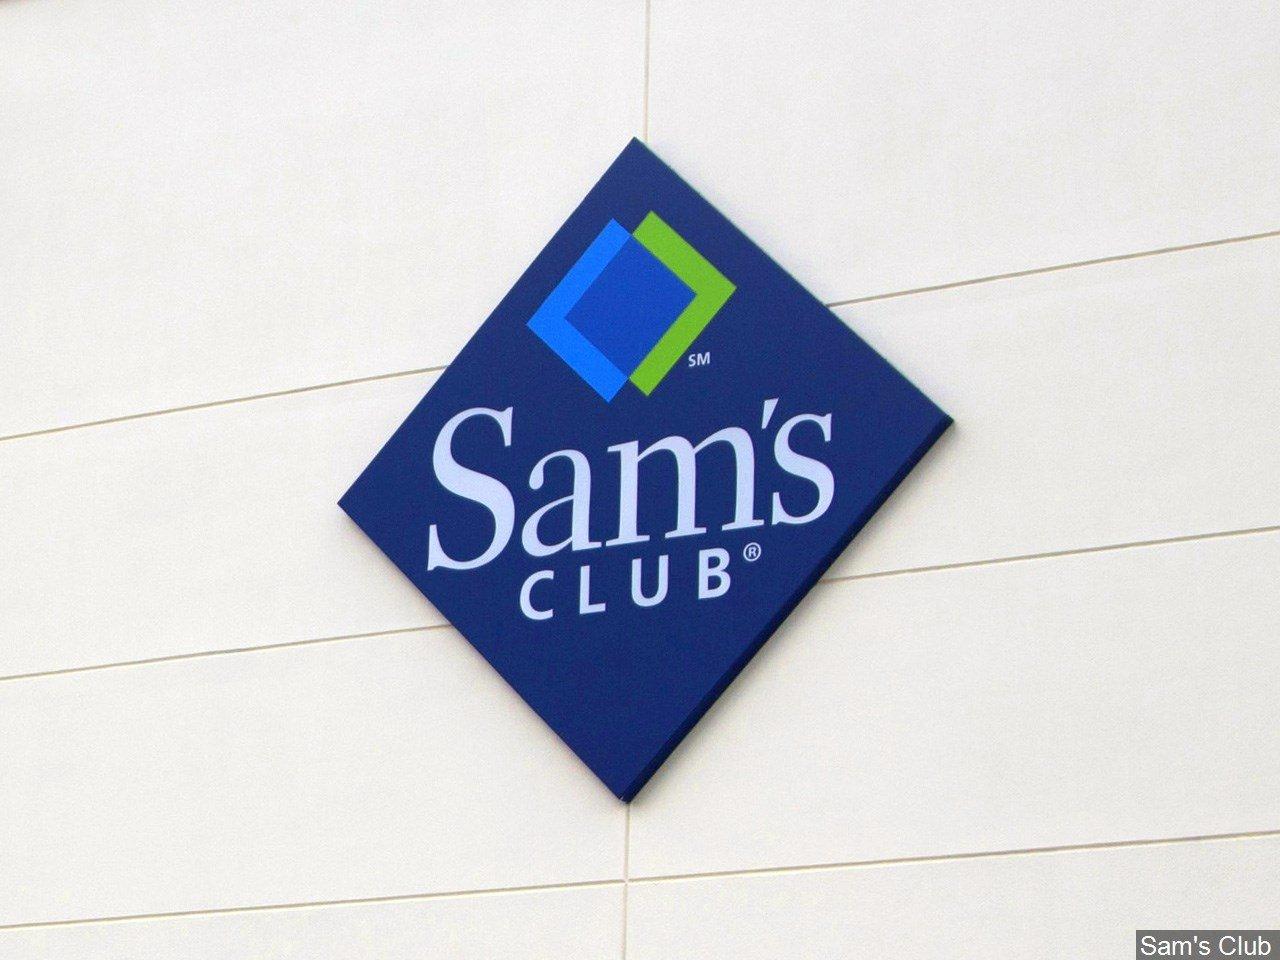 Houston-area Sam's Club stores abruptly close